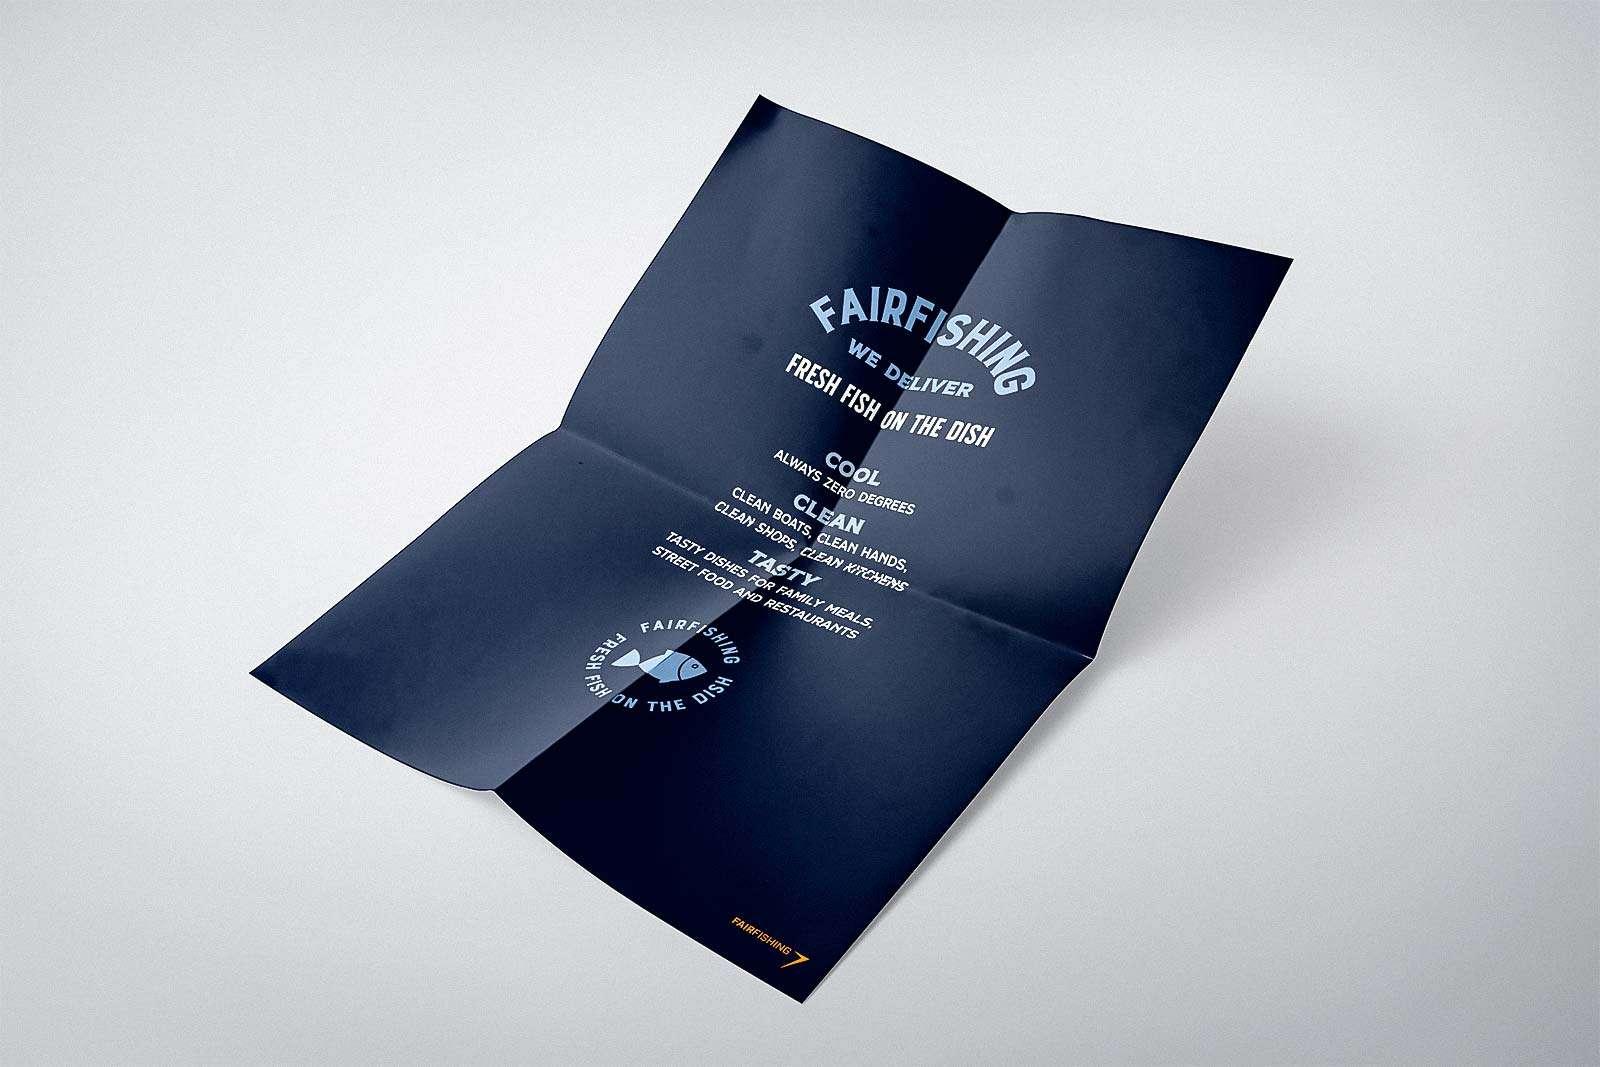 Fairfishing poster